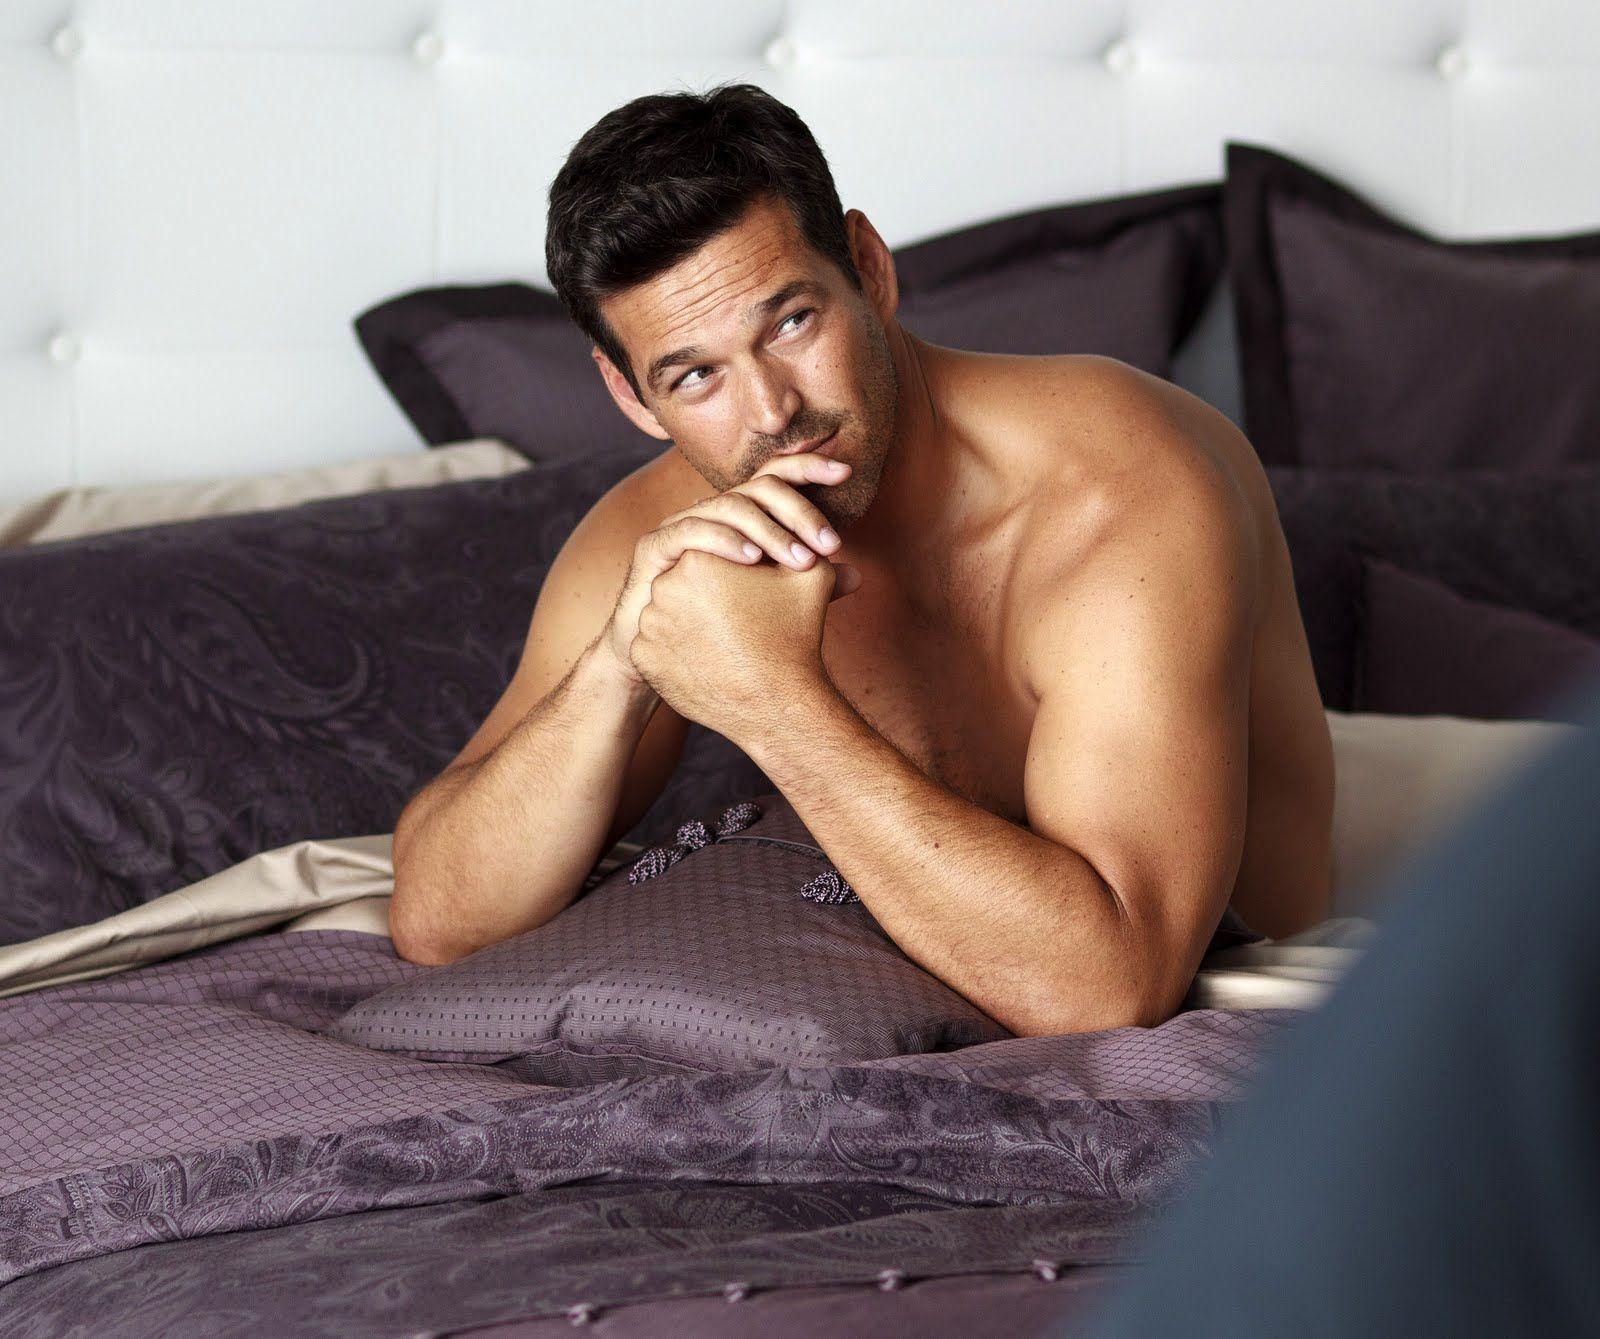 I'd like waking up next to him!